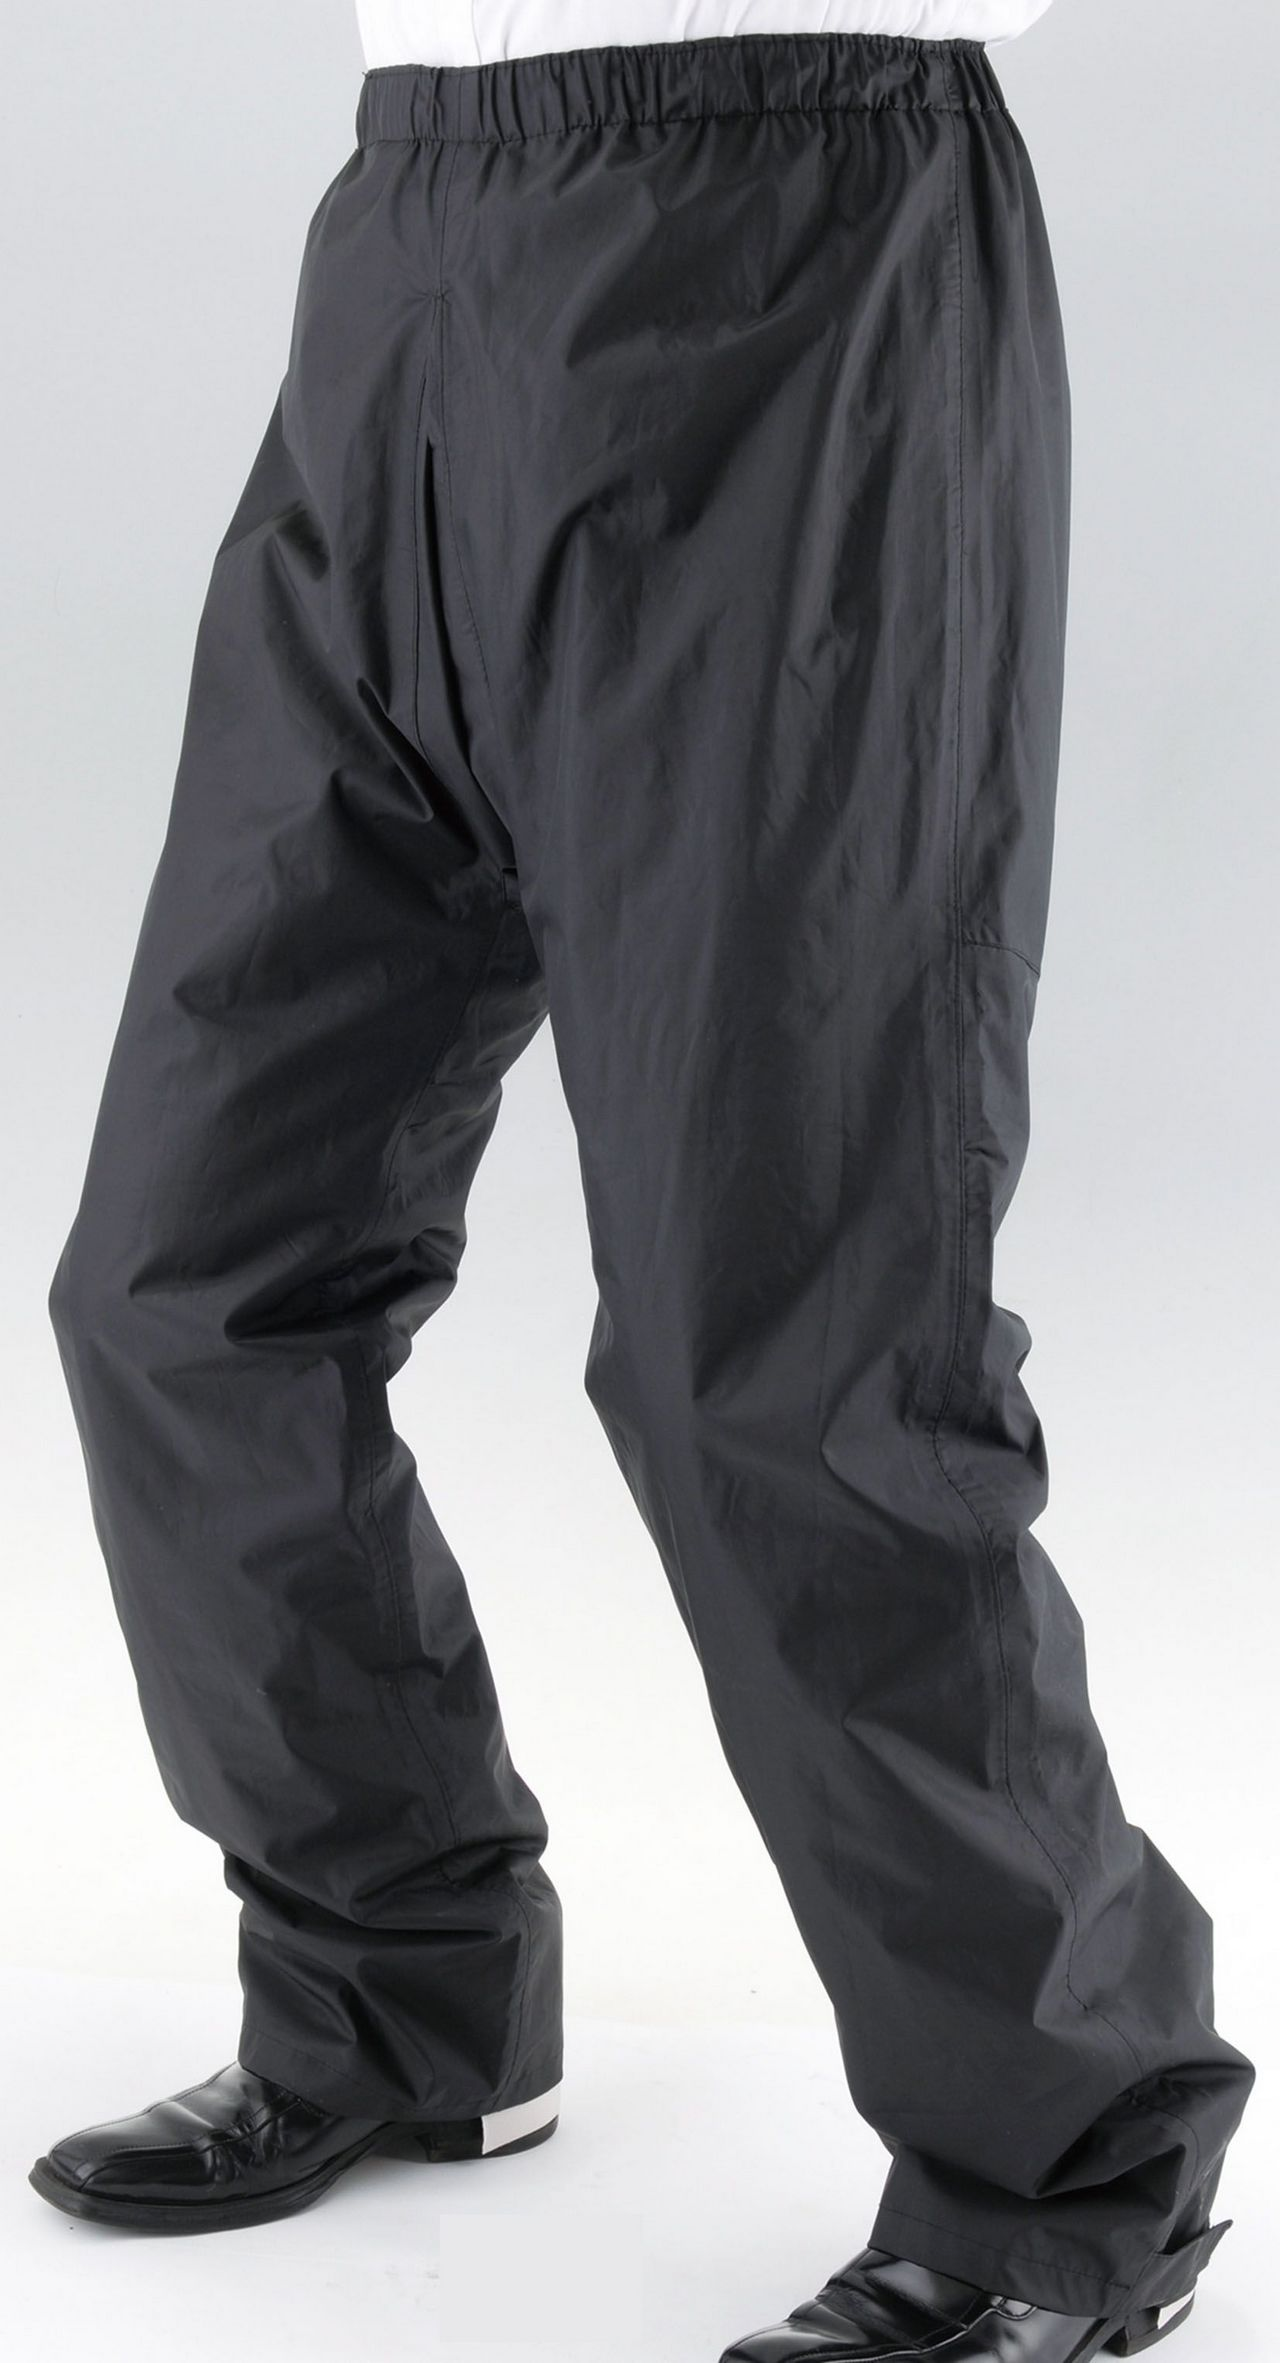 【4R】黑色雨褲 Resist  - 「Webike-摩托百貨」